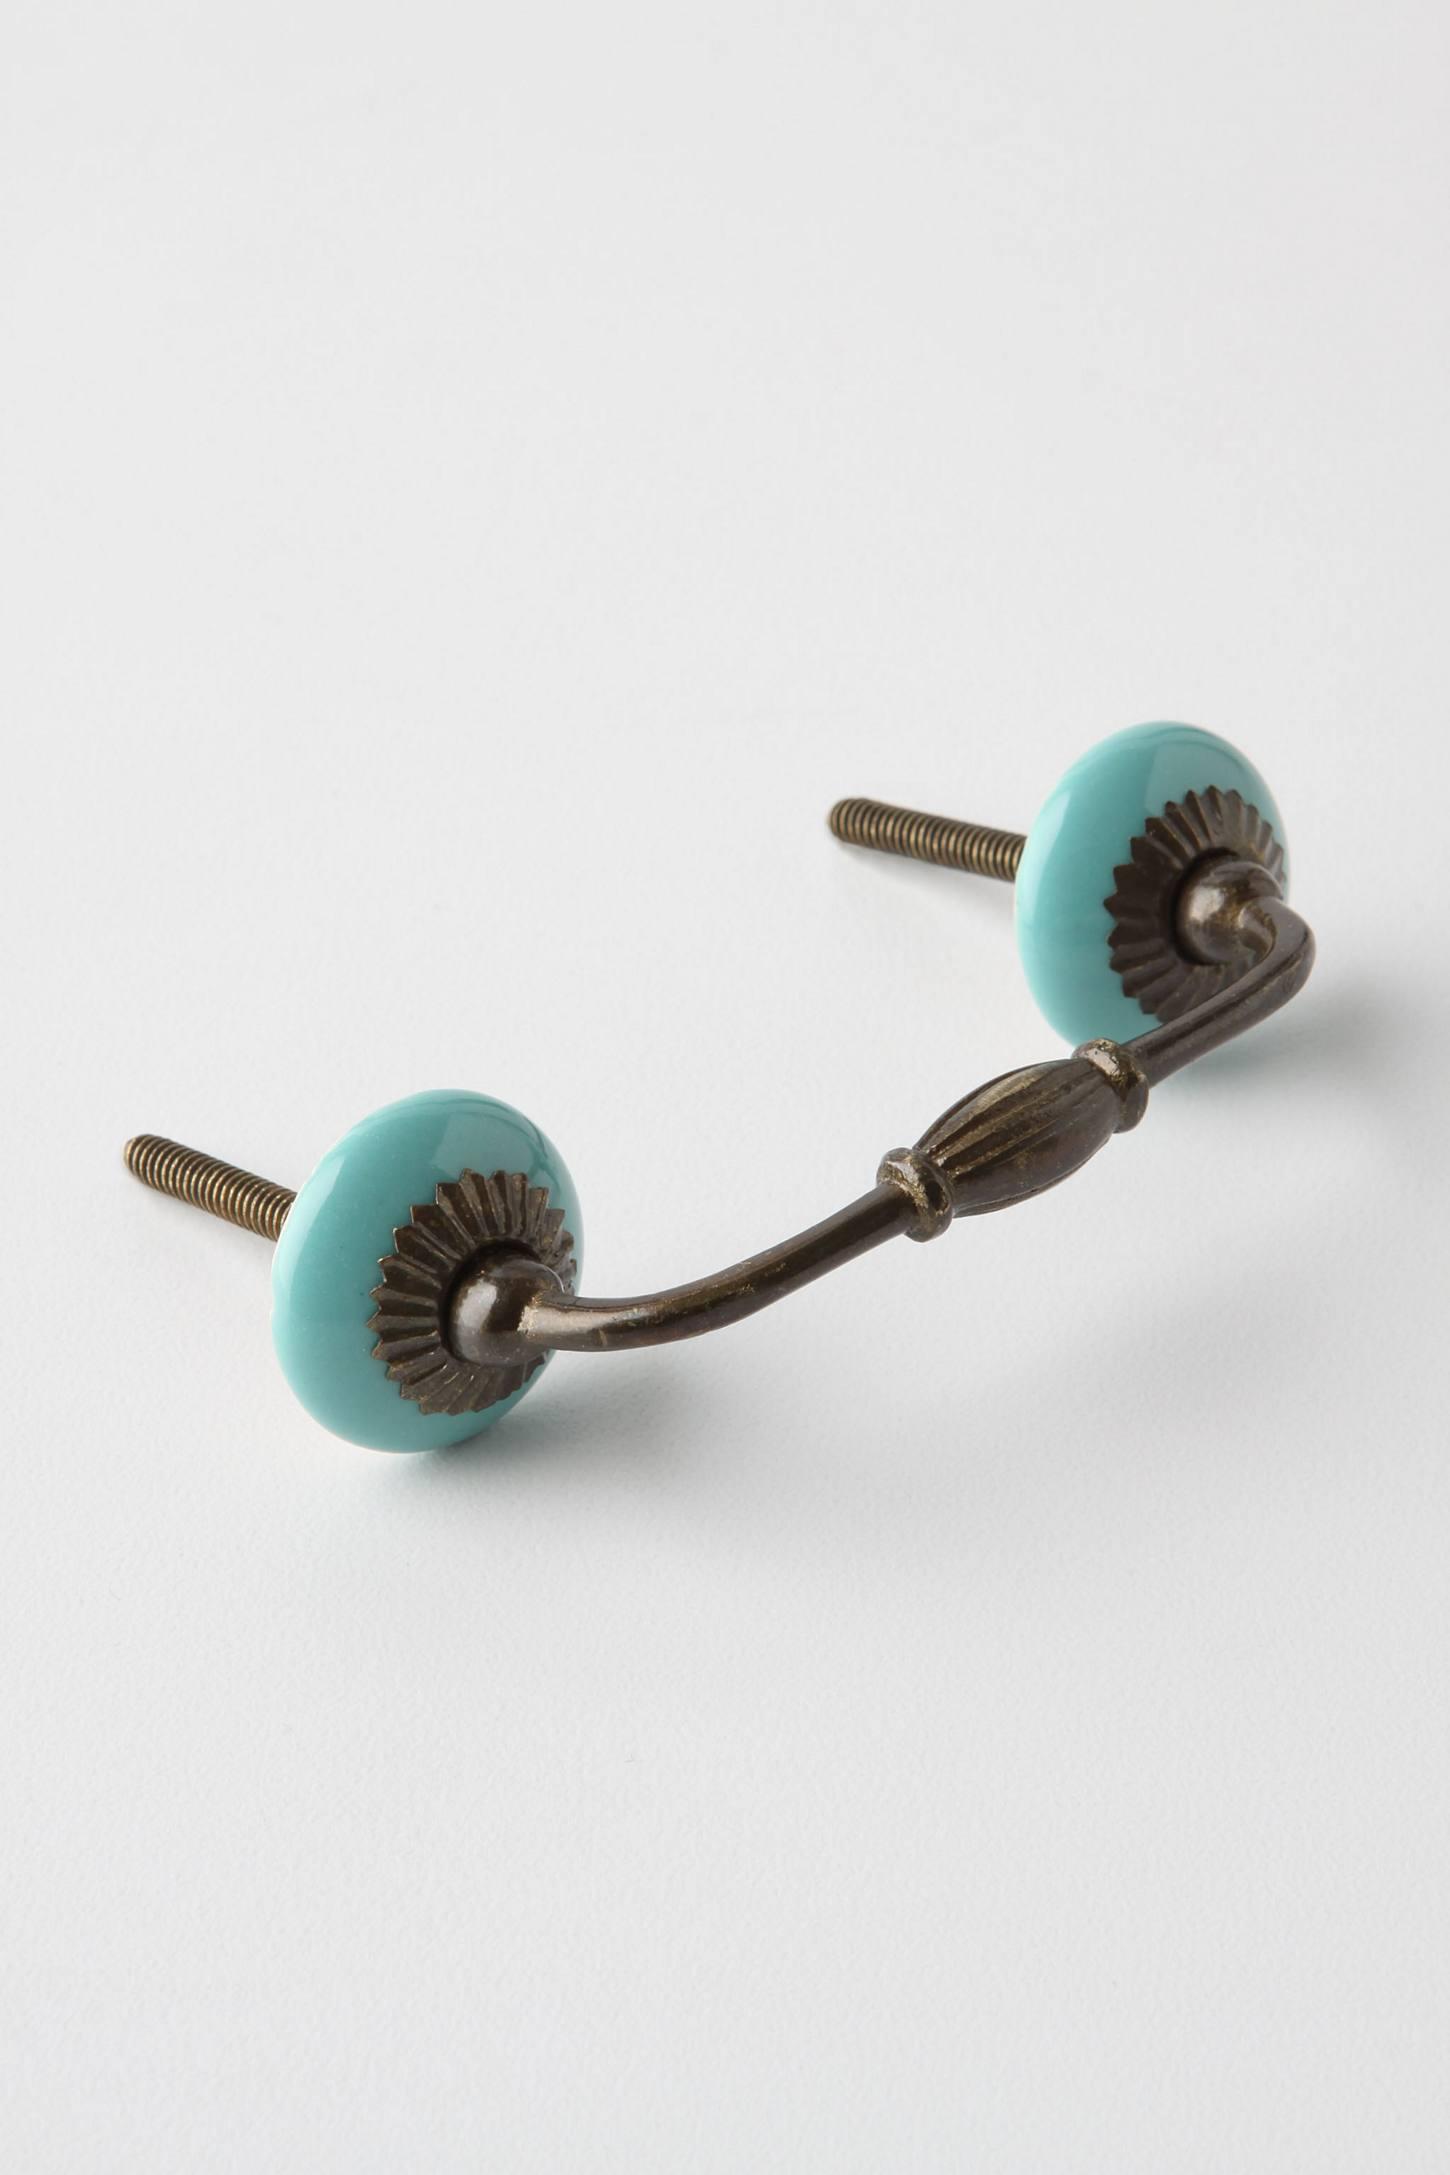 Vintage blue handle